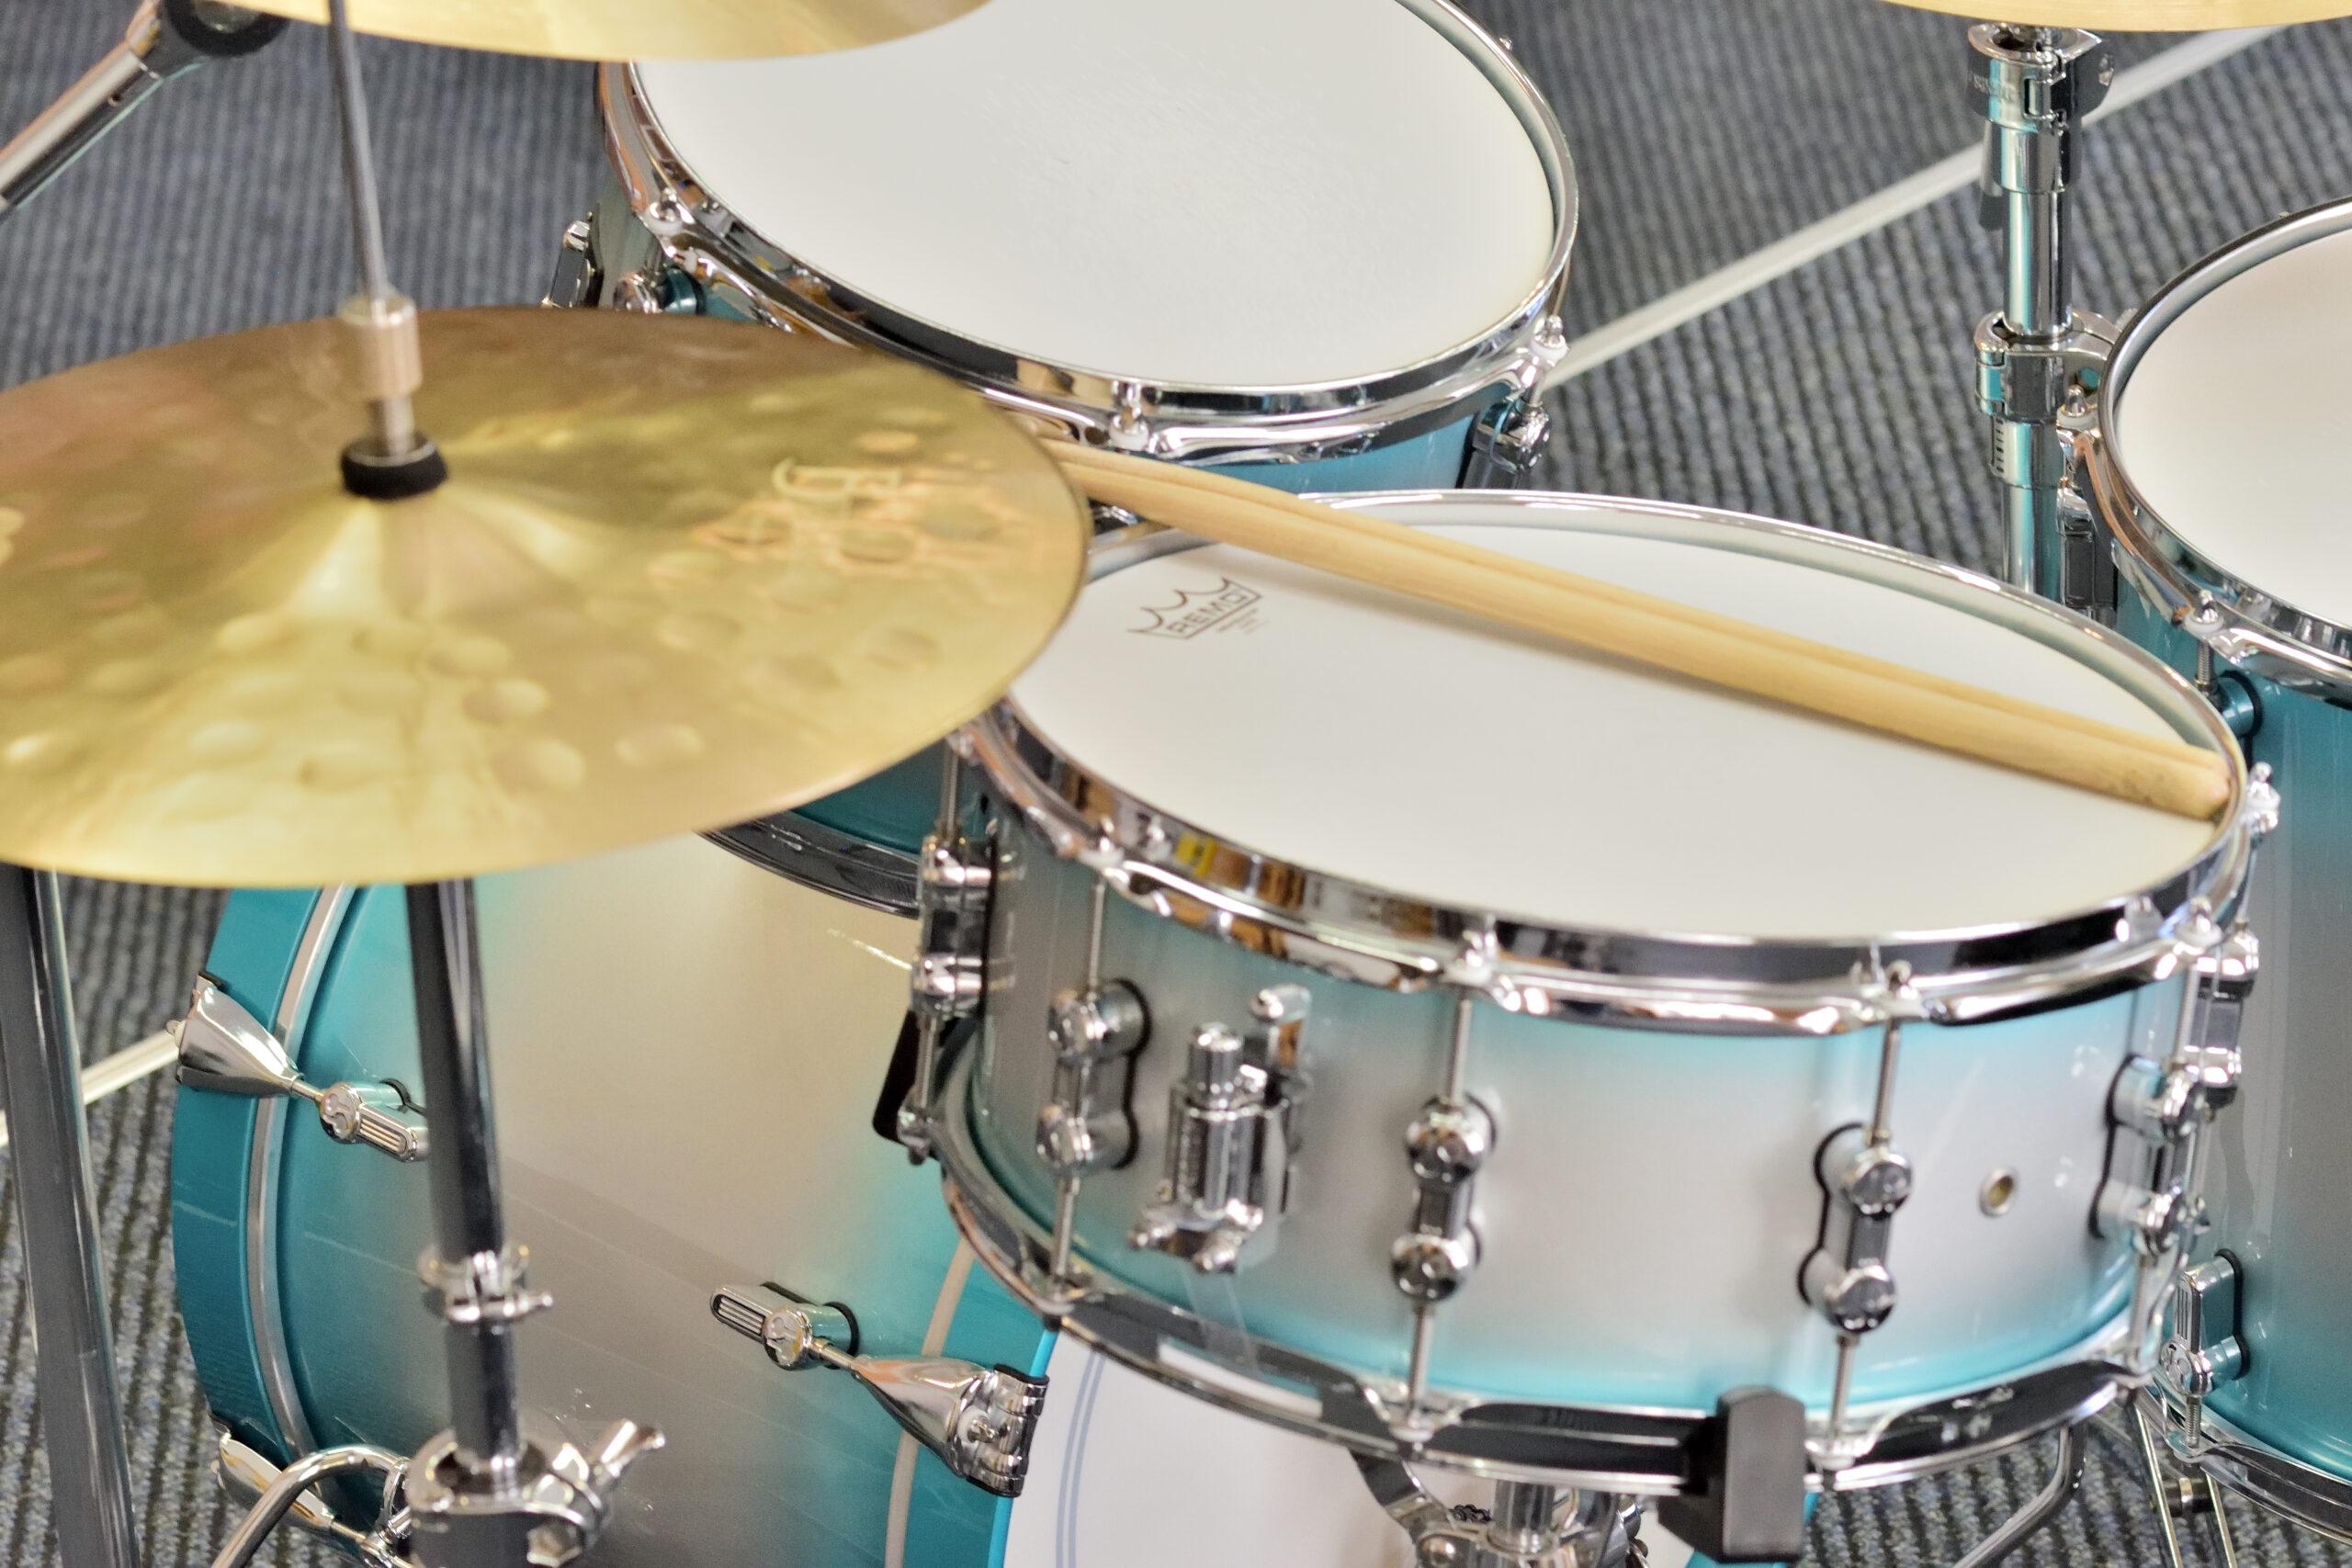 Nahaufnahme des Schlagzeugs